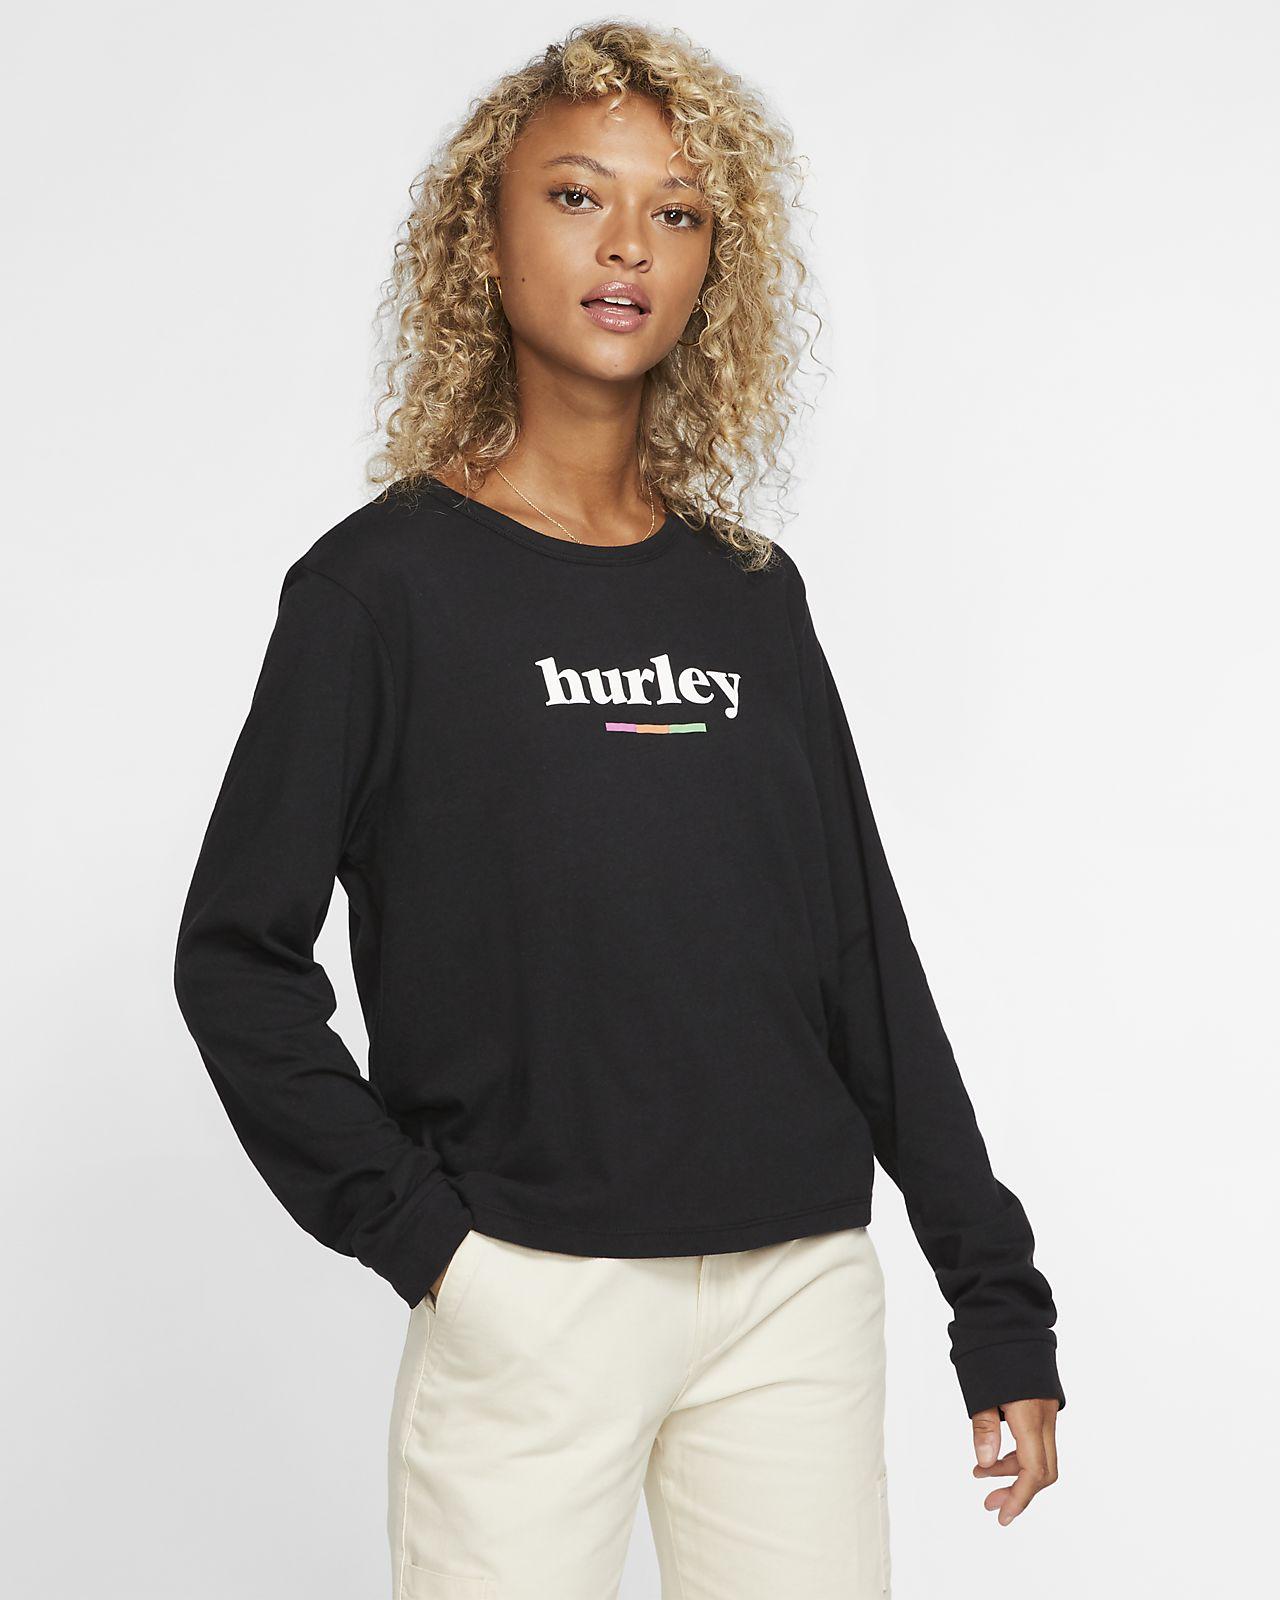 Hurley Pompel Perfect Women's Long-Sleeve T-Shirt